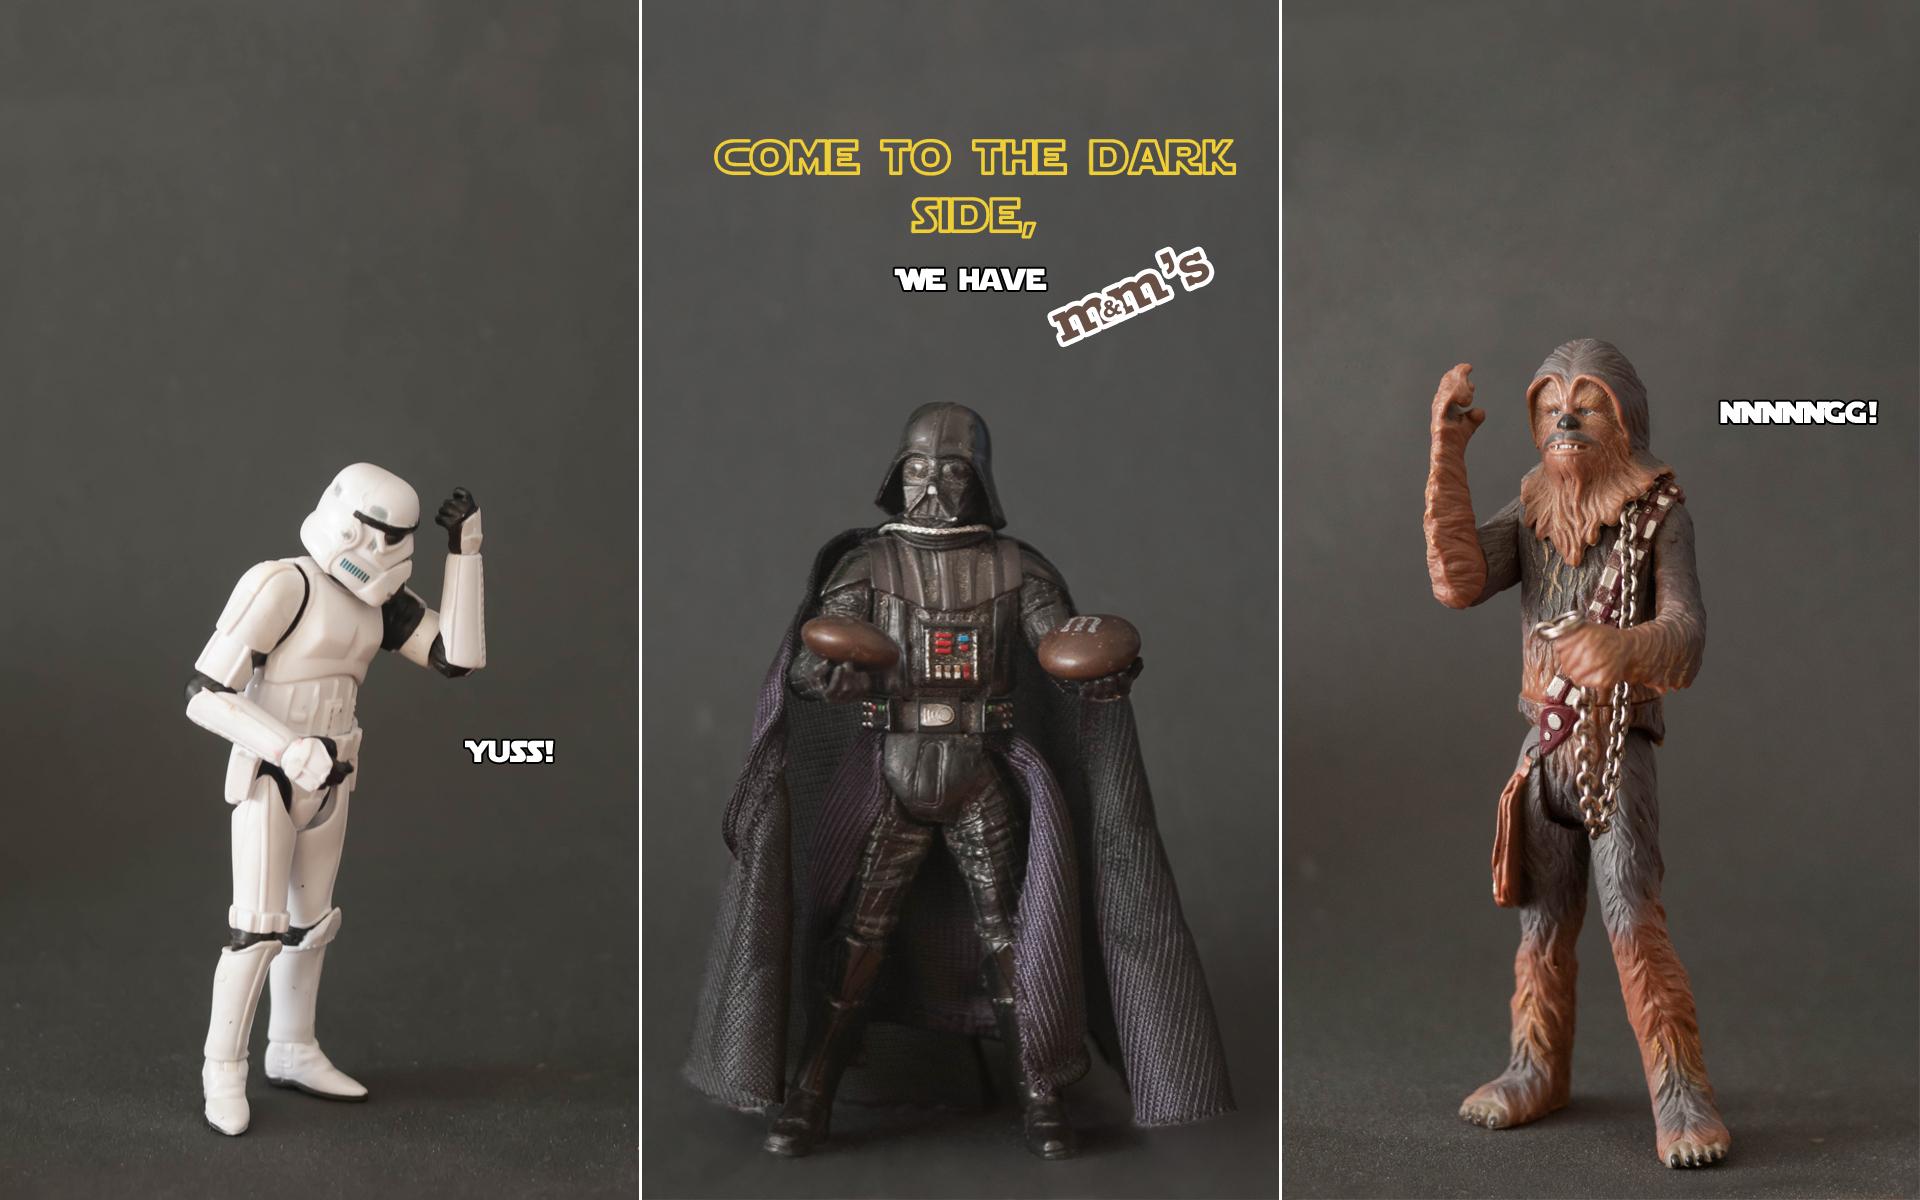 Star Wars stormtroopers Darth Vader Chewbacca wallpaper 1920x1200 1920x1200